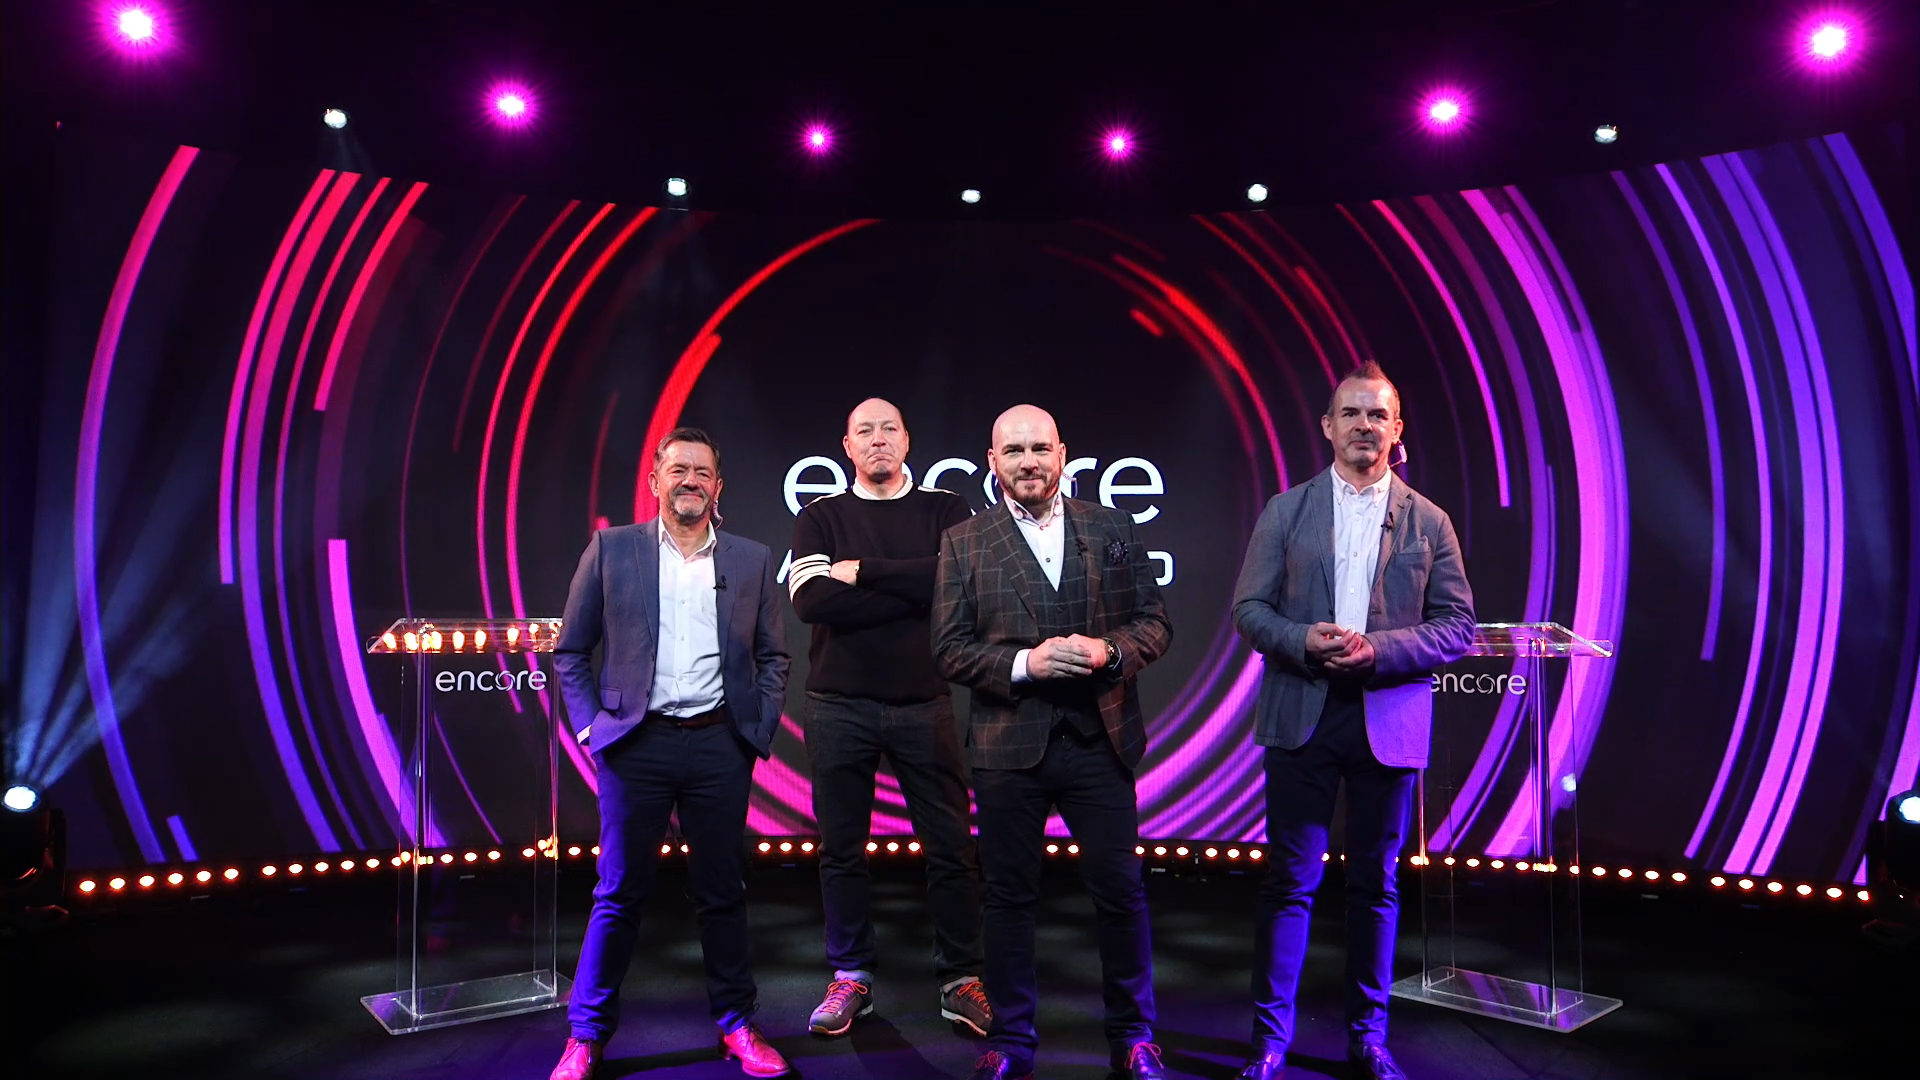 Encore Celebrates Momentous Success of Staff During Pandemic